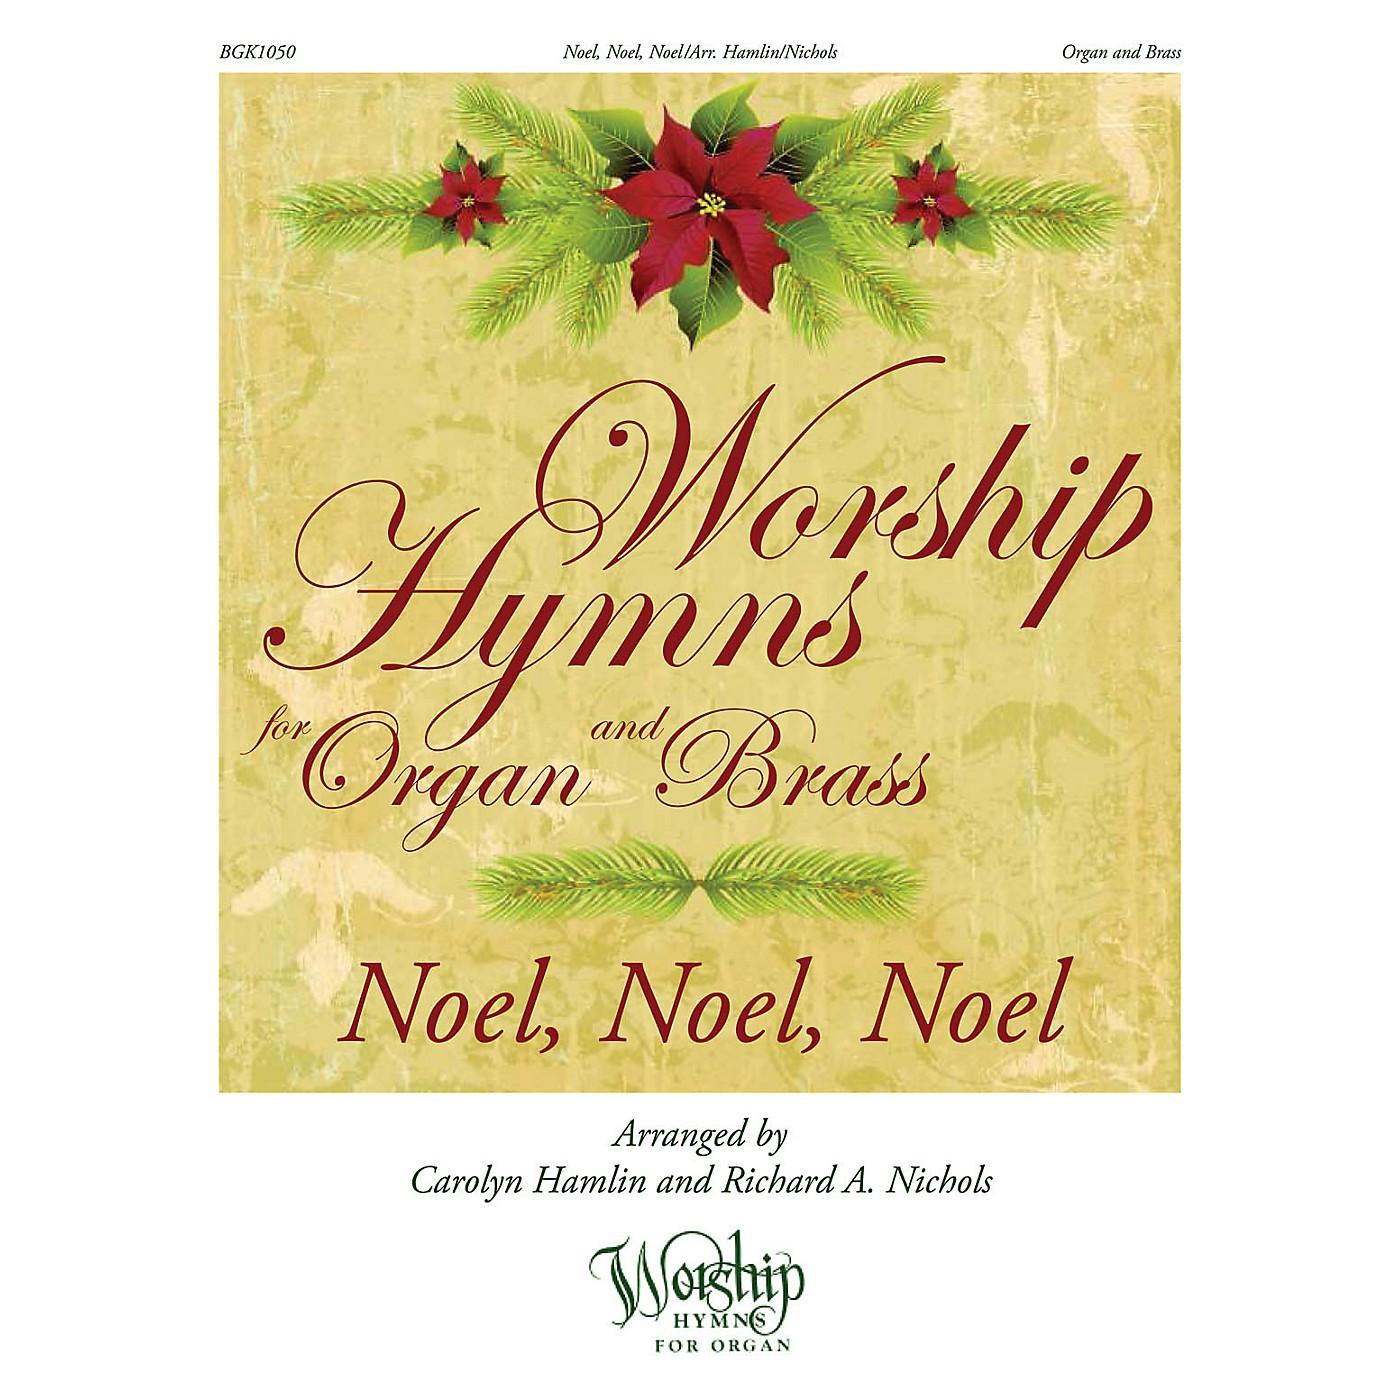 H.T. FitzSimons Company Noel, Noel, Noel (Worship Hymns for Organ and Brass) arranged by Carolyn Hamlin thumbnail